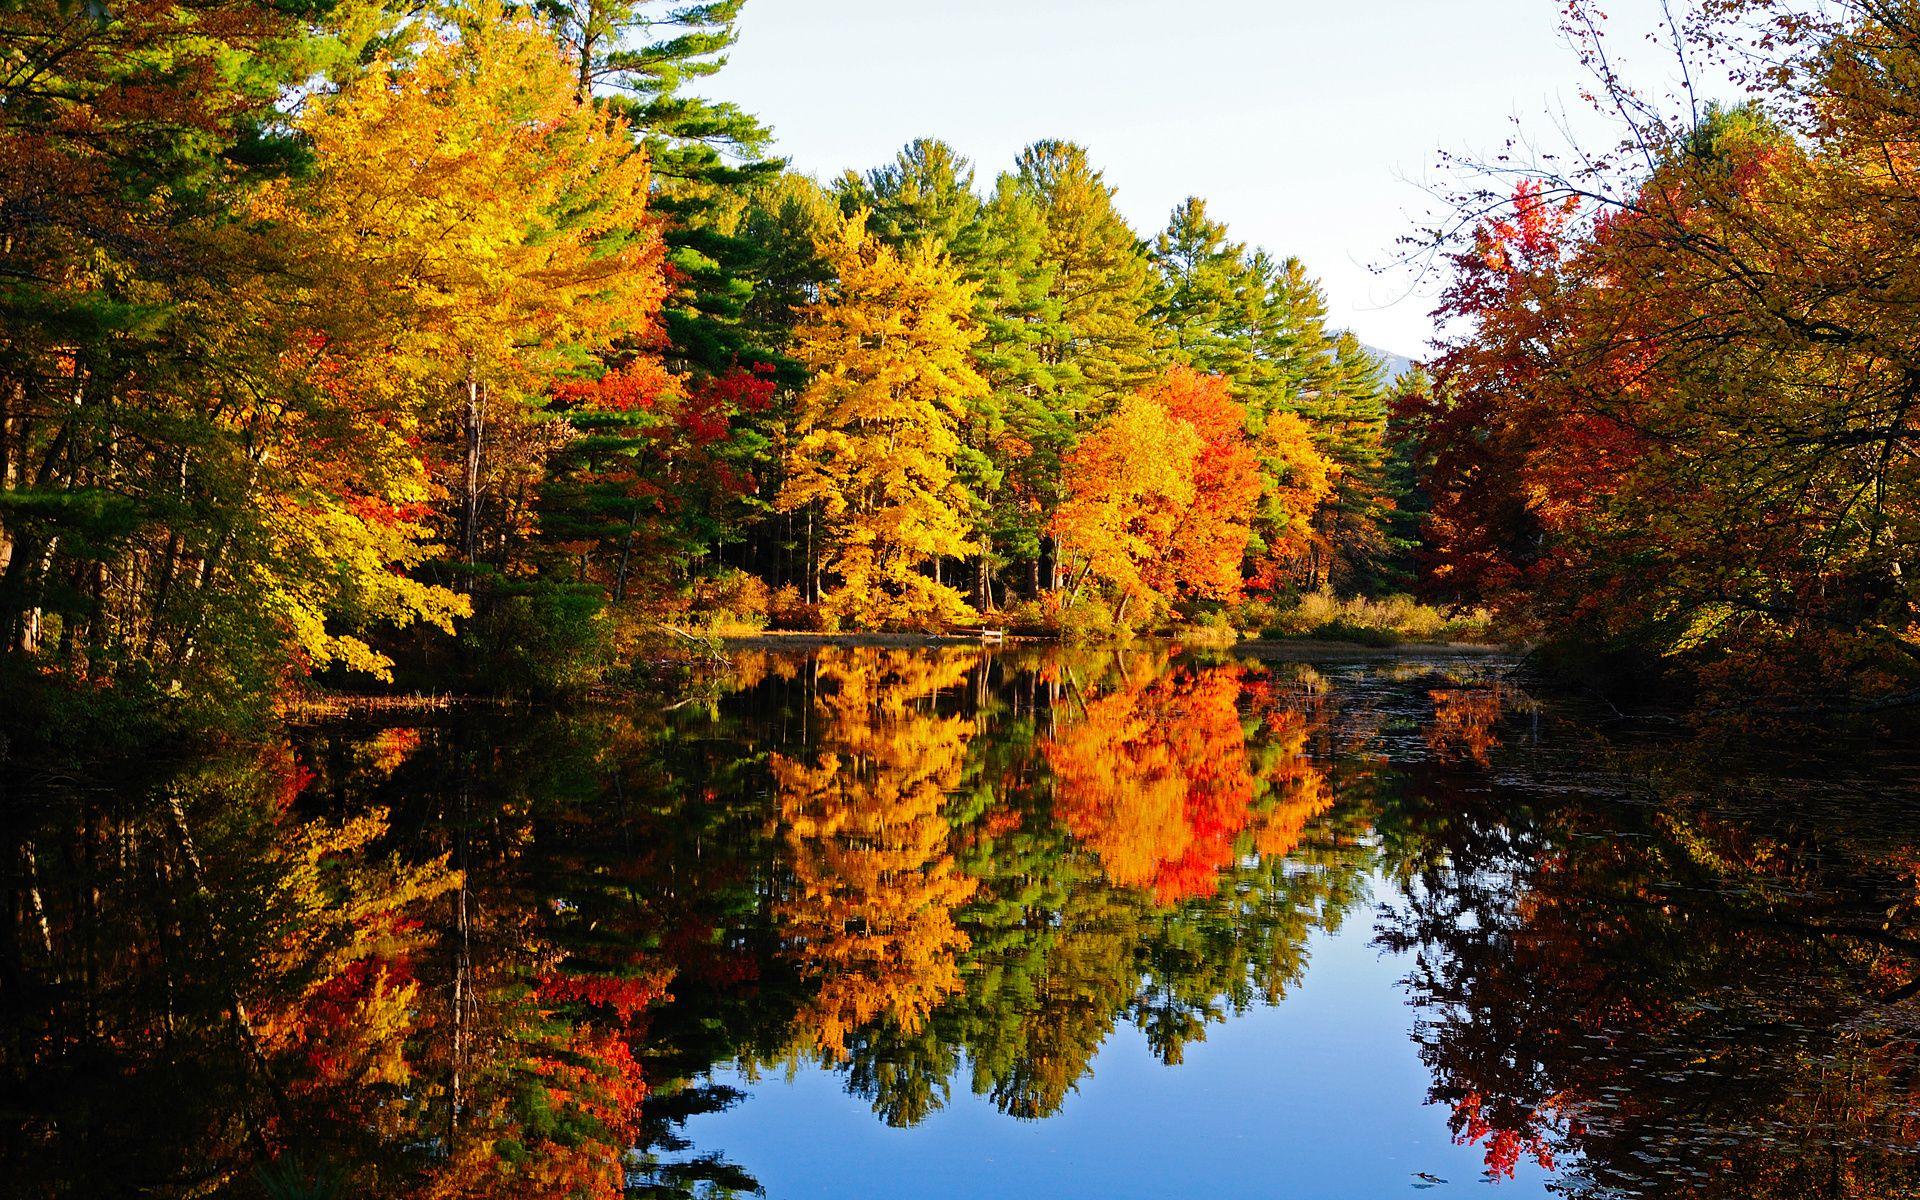 Картинка на рабочий стол про осень